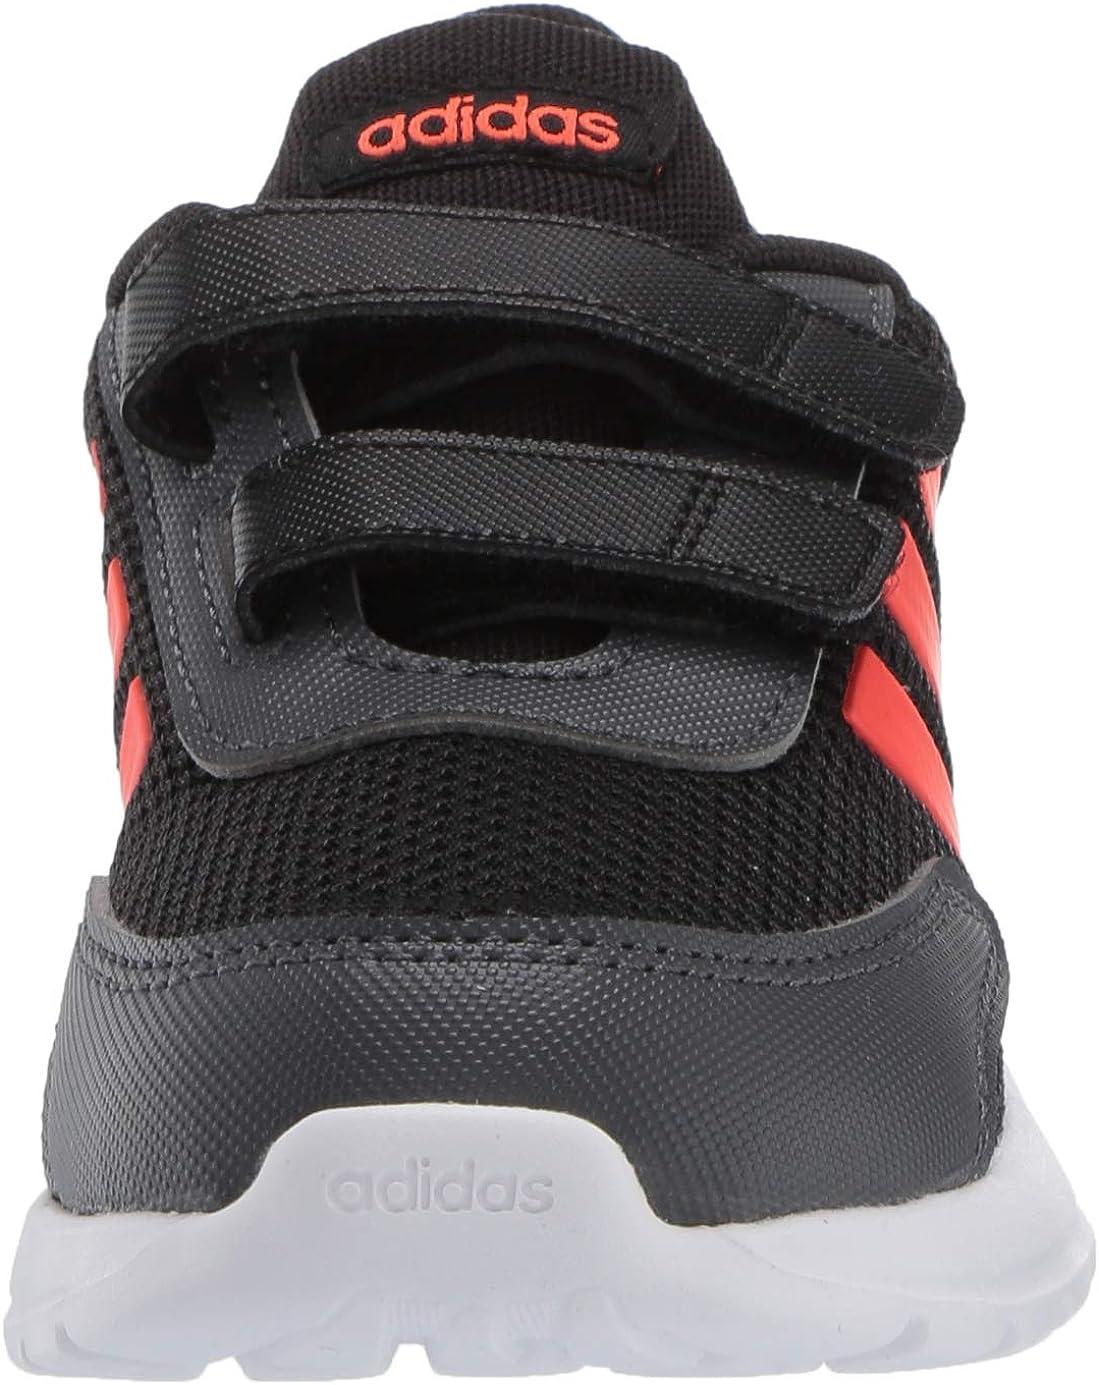 | adidas Unisex-Child Tensaur Run I Sneaker | Fashion Sneakers